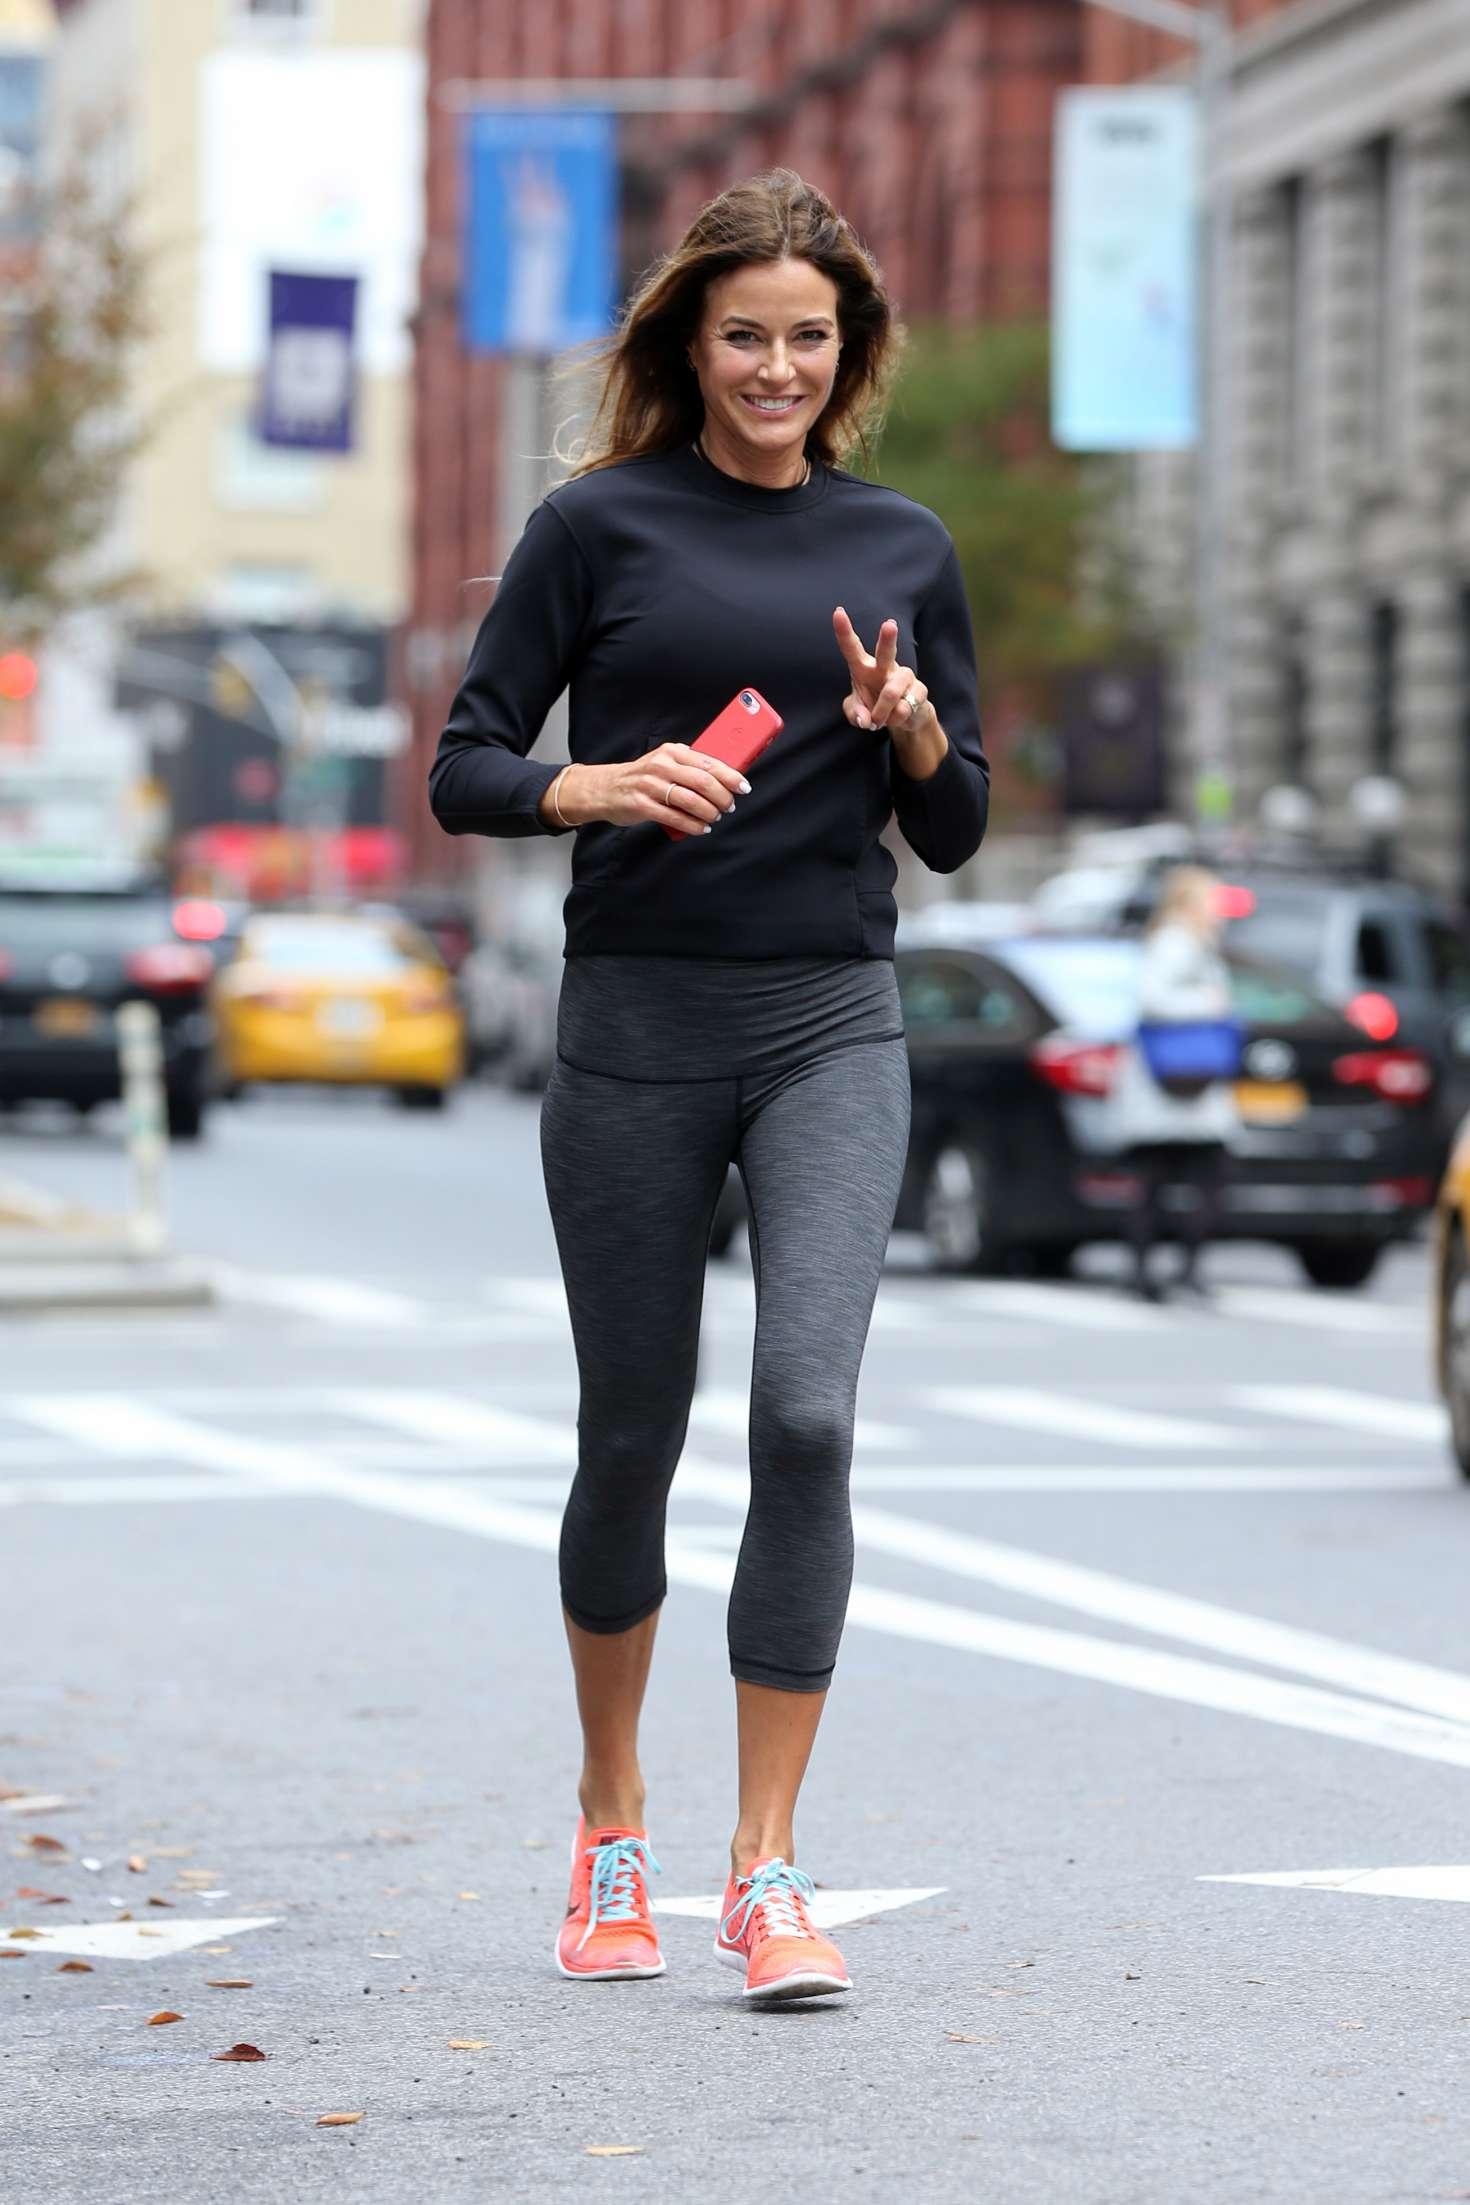 Kelly Bensimon 2017 : Kelly Bensimon: Goes for a jog in NYC -04